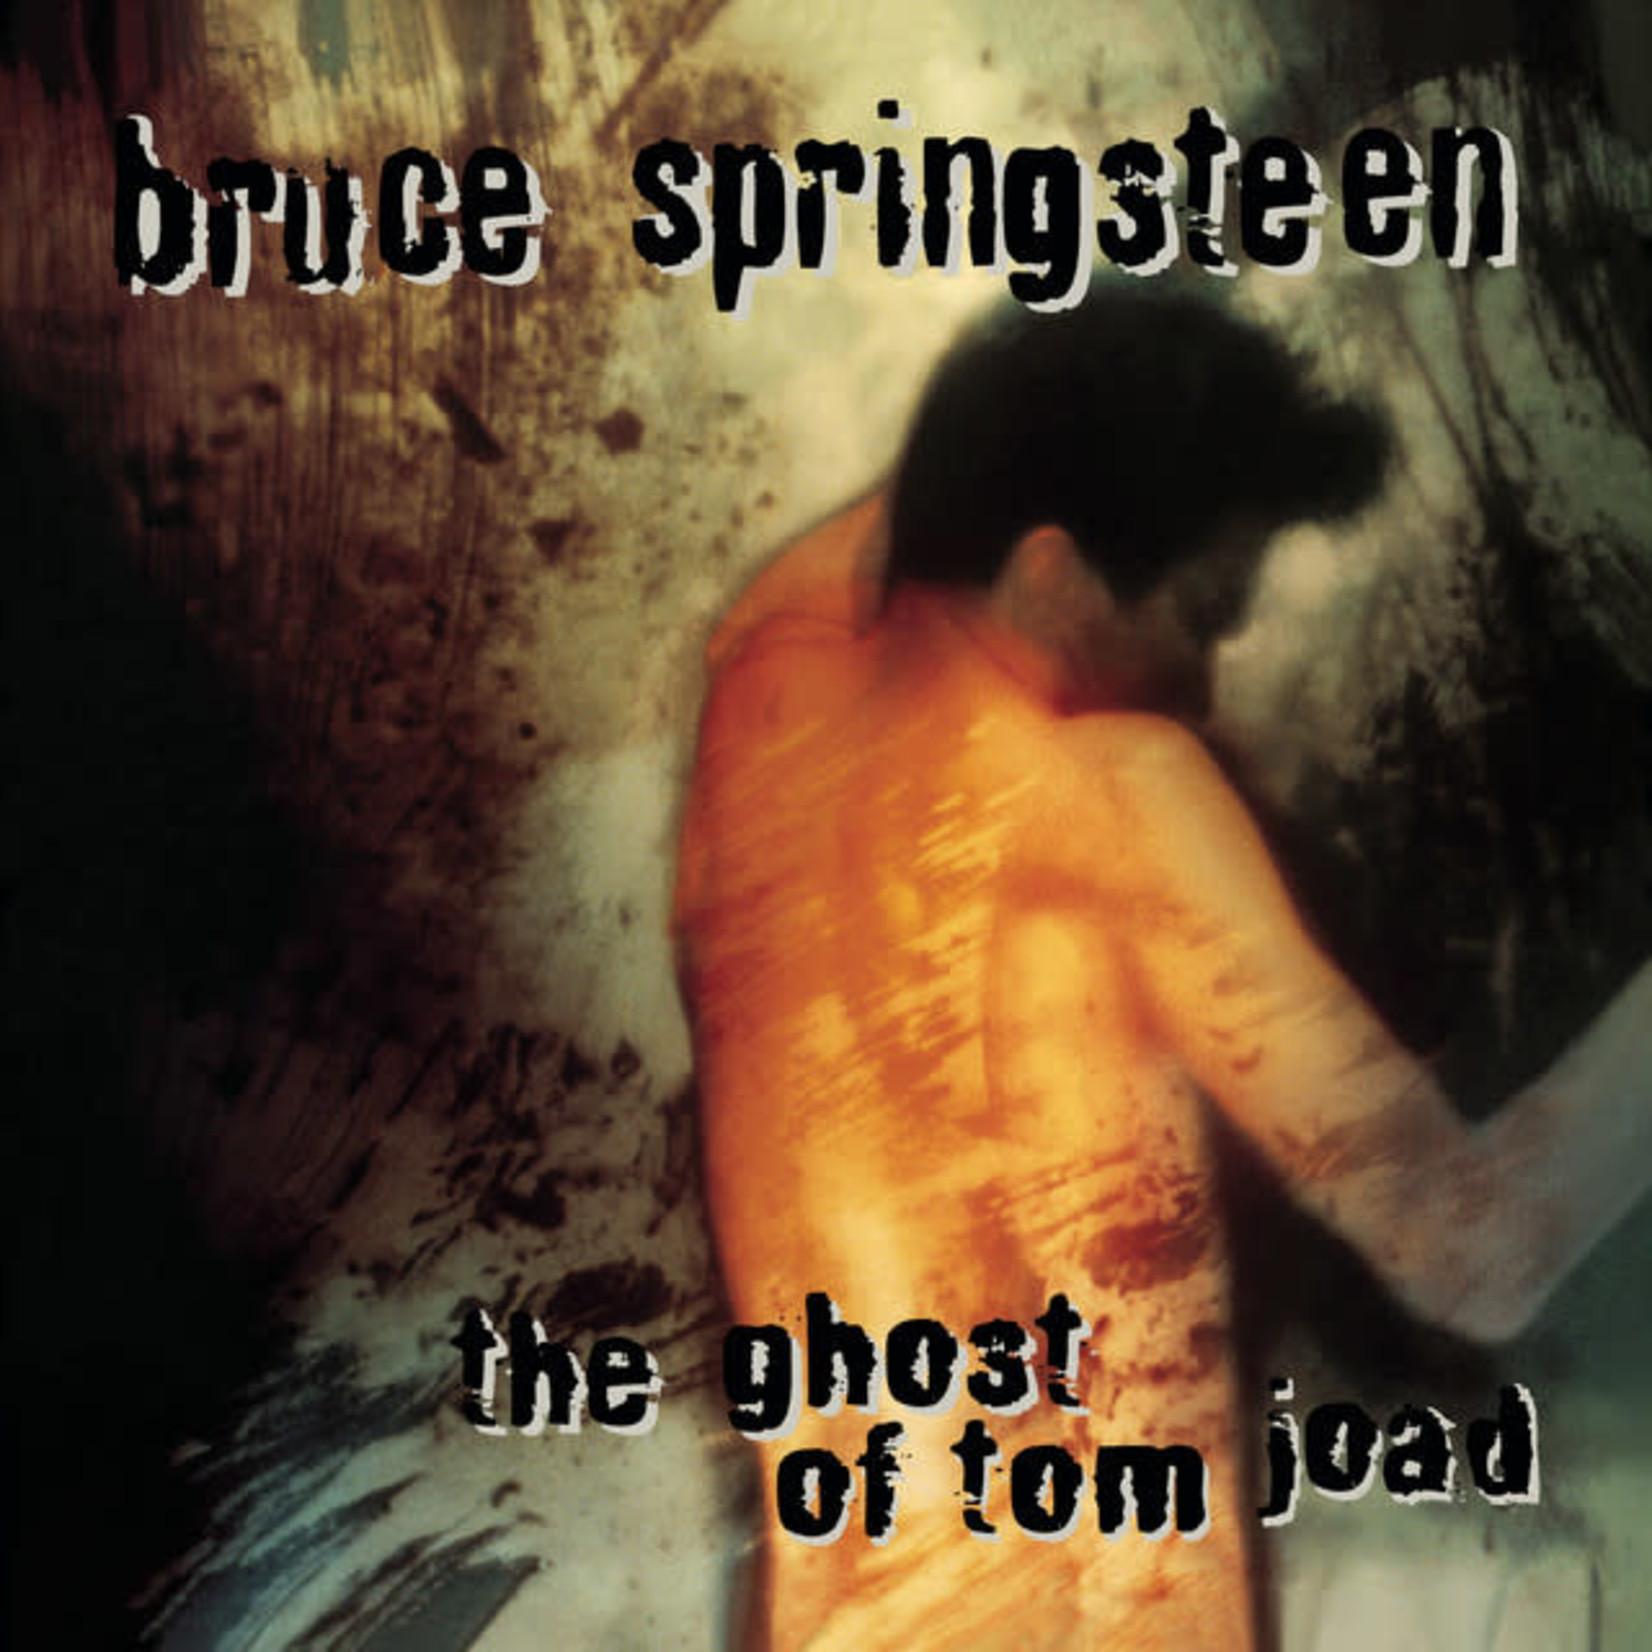 Vinyl Bruce Springsteen - The Ghost of Tom Joad